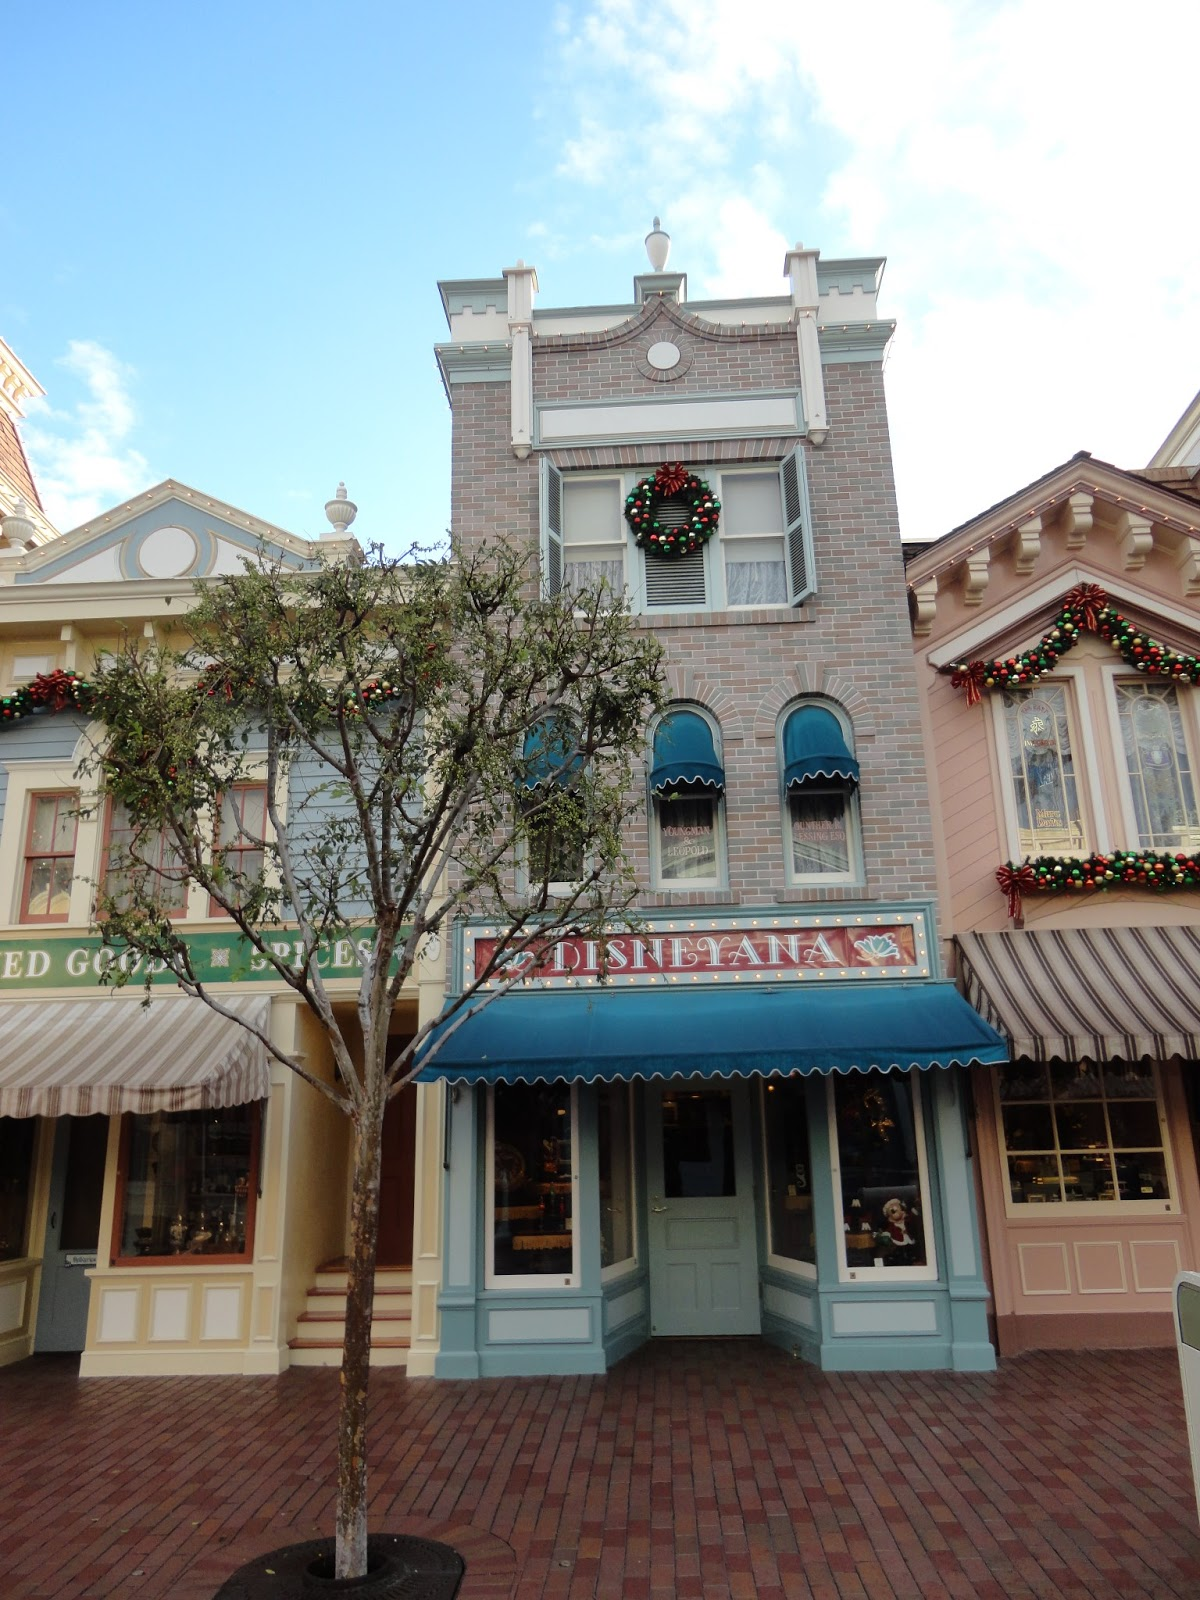 Disneyland Main Street Disneyana Building